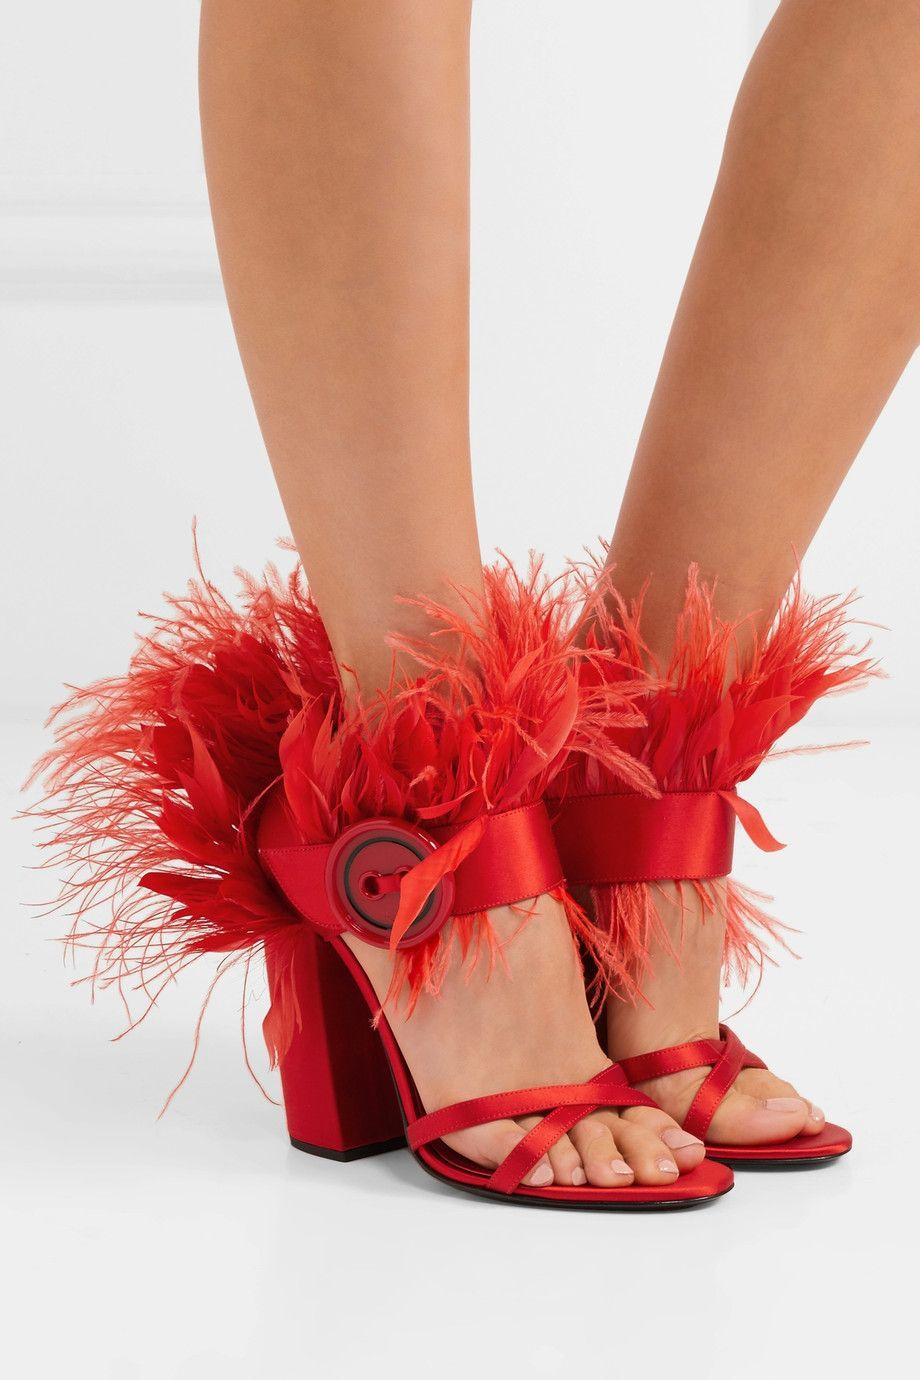 ea9e3bec42a Prada - Feather-trimmed satin sandals